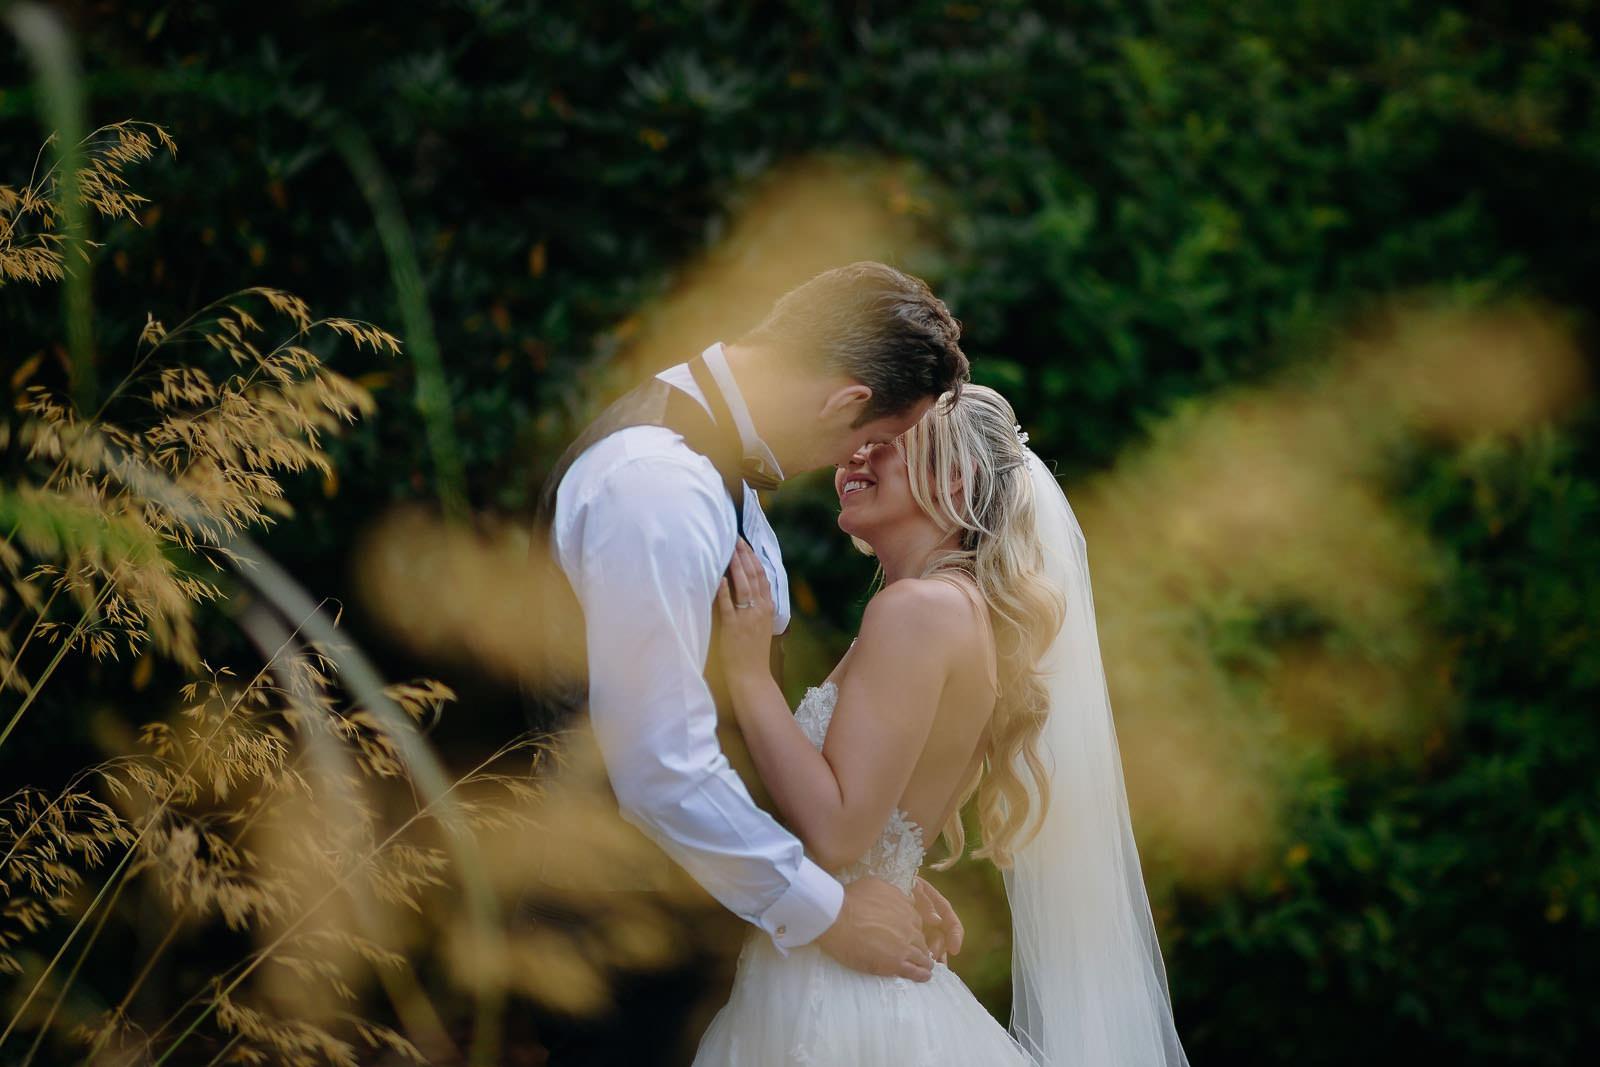 Hutton Hall wedding photography